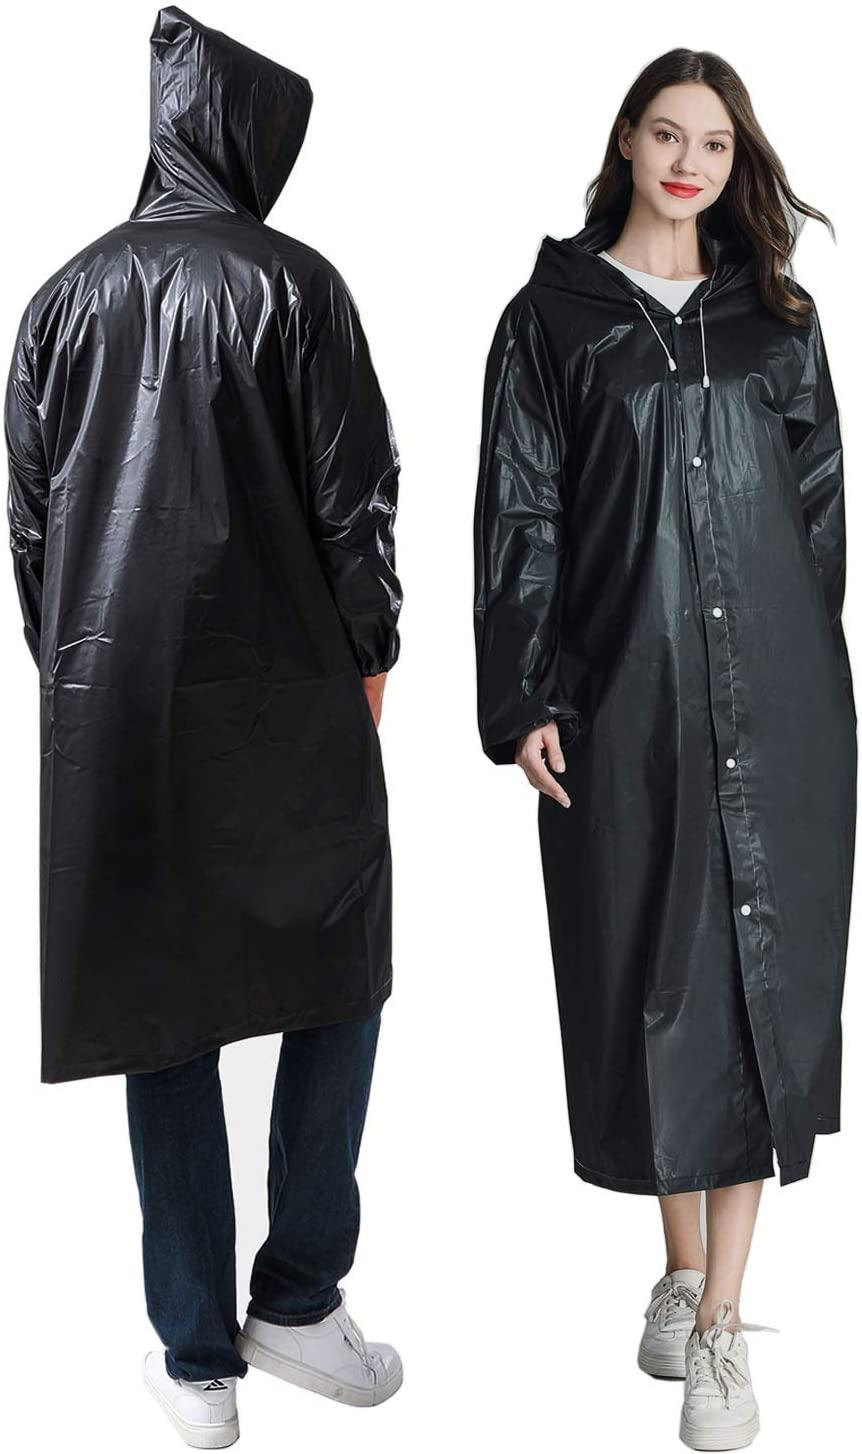 NEOYARDE Raincoat, 2 Pack Emergency Reusable EVA Rain Ponchos Rain Coats with Drawsting Hood and Elastic Cuff Sleeves